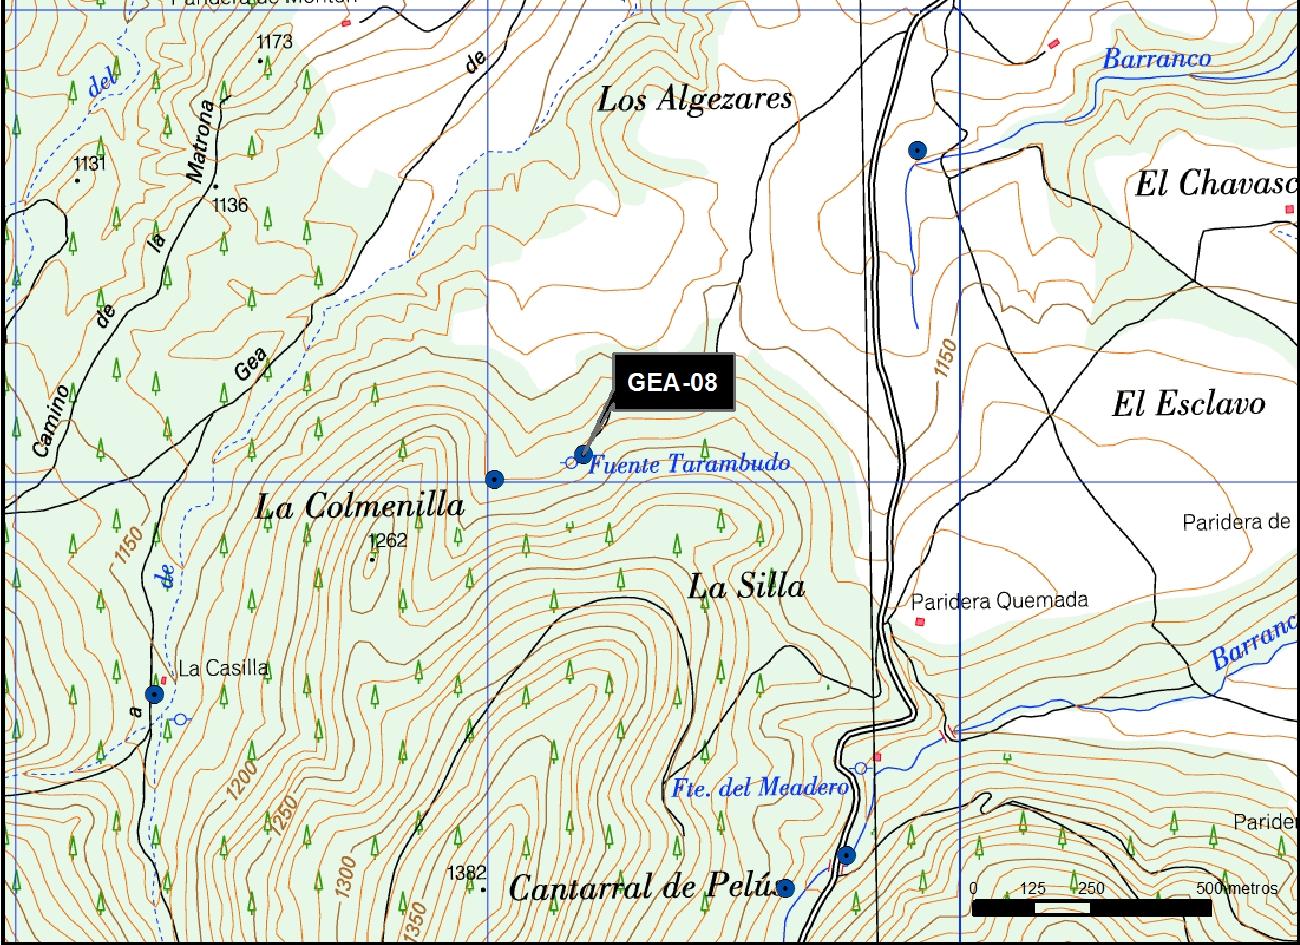 GEA_08_M.V.LOZANO_TARAMBUDO O TÍO ARAMBUDO_MAP.TOPO 2